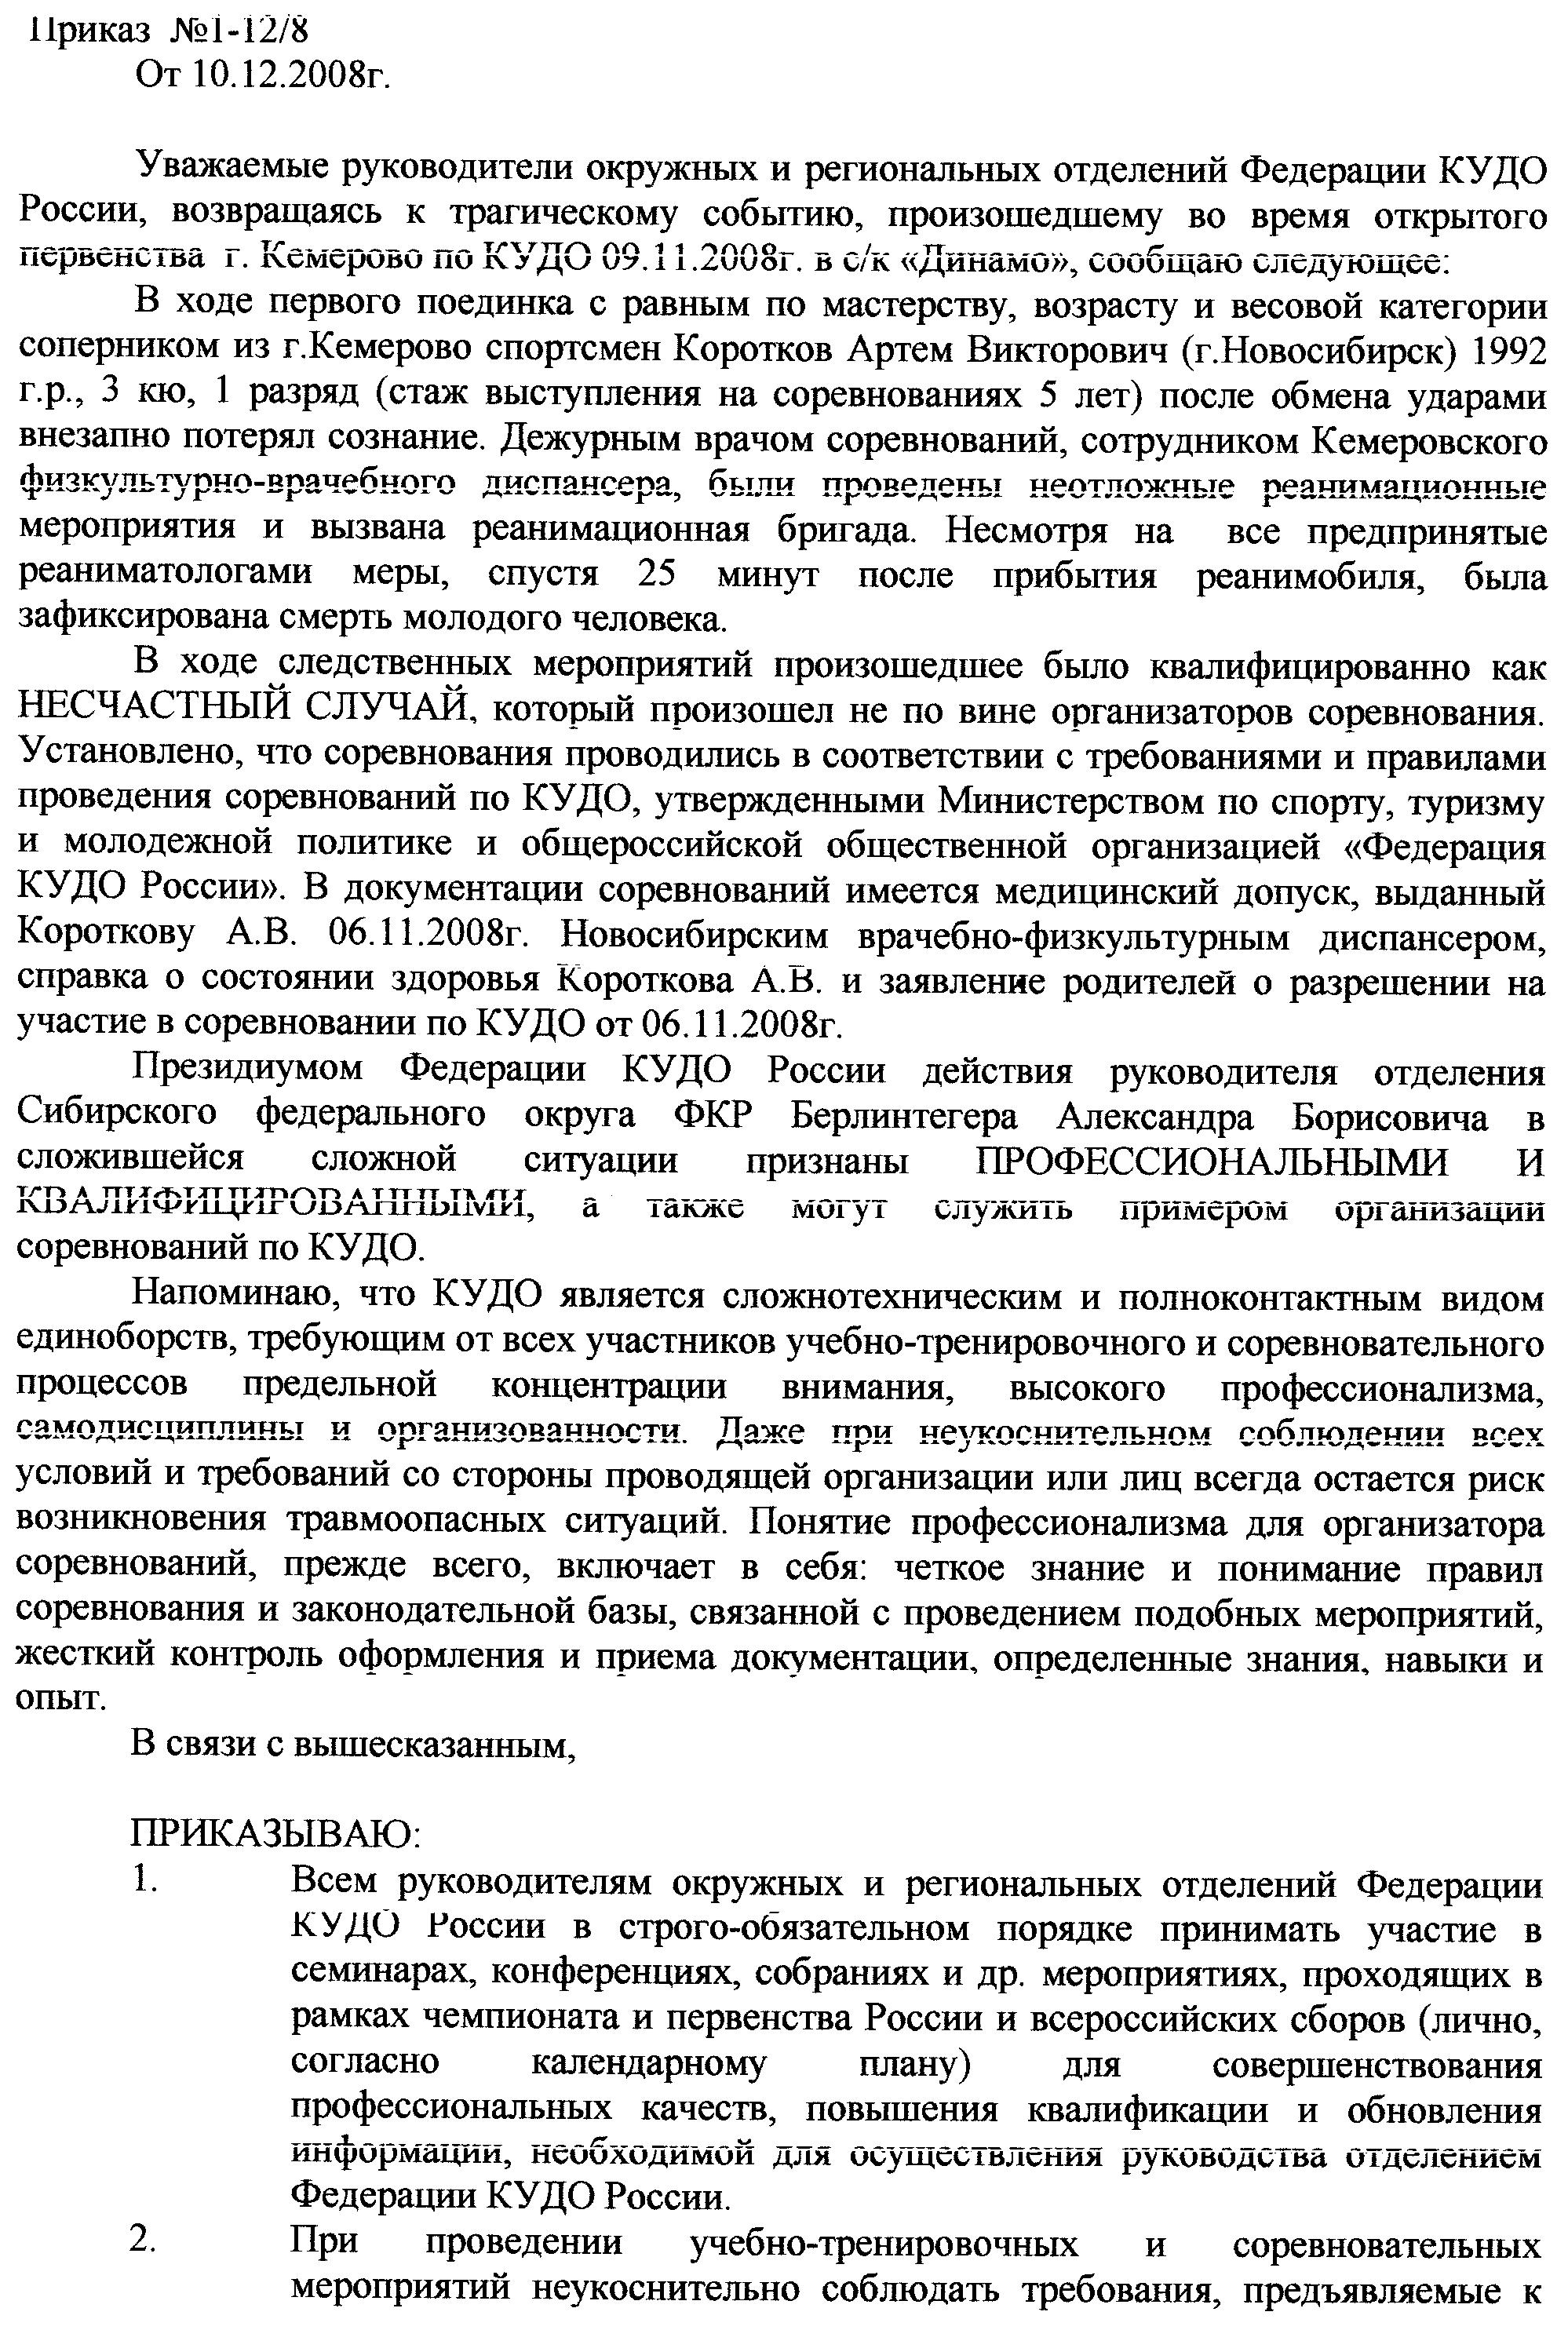 Приказ Президента Федерации КУДО России